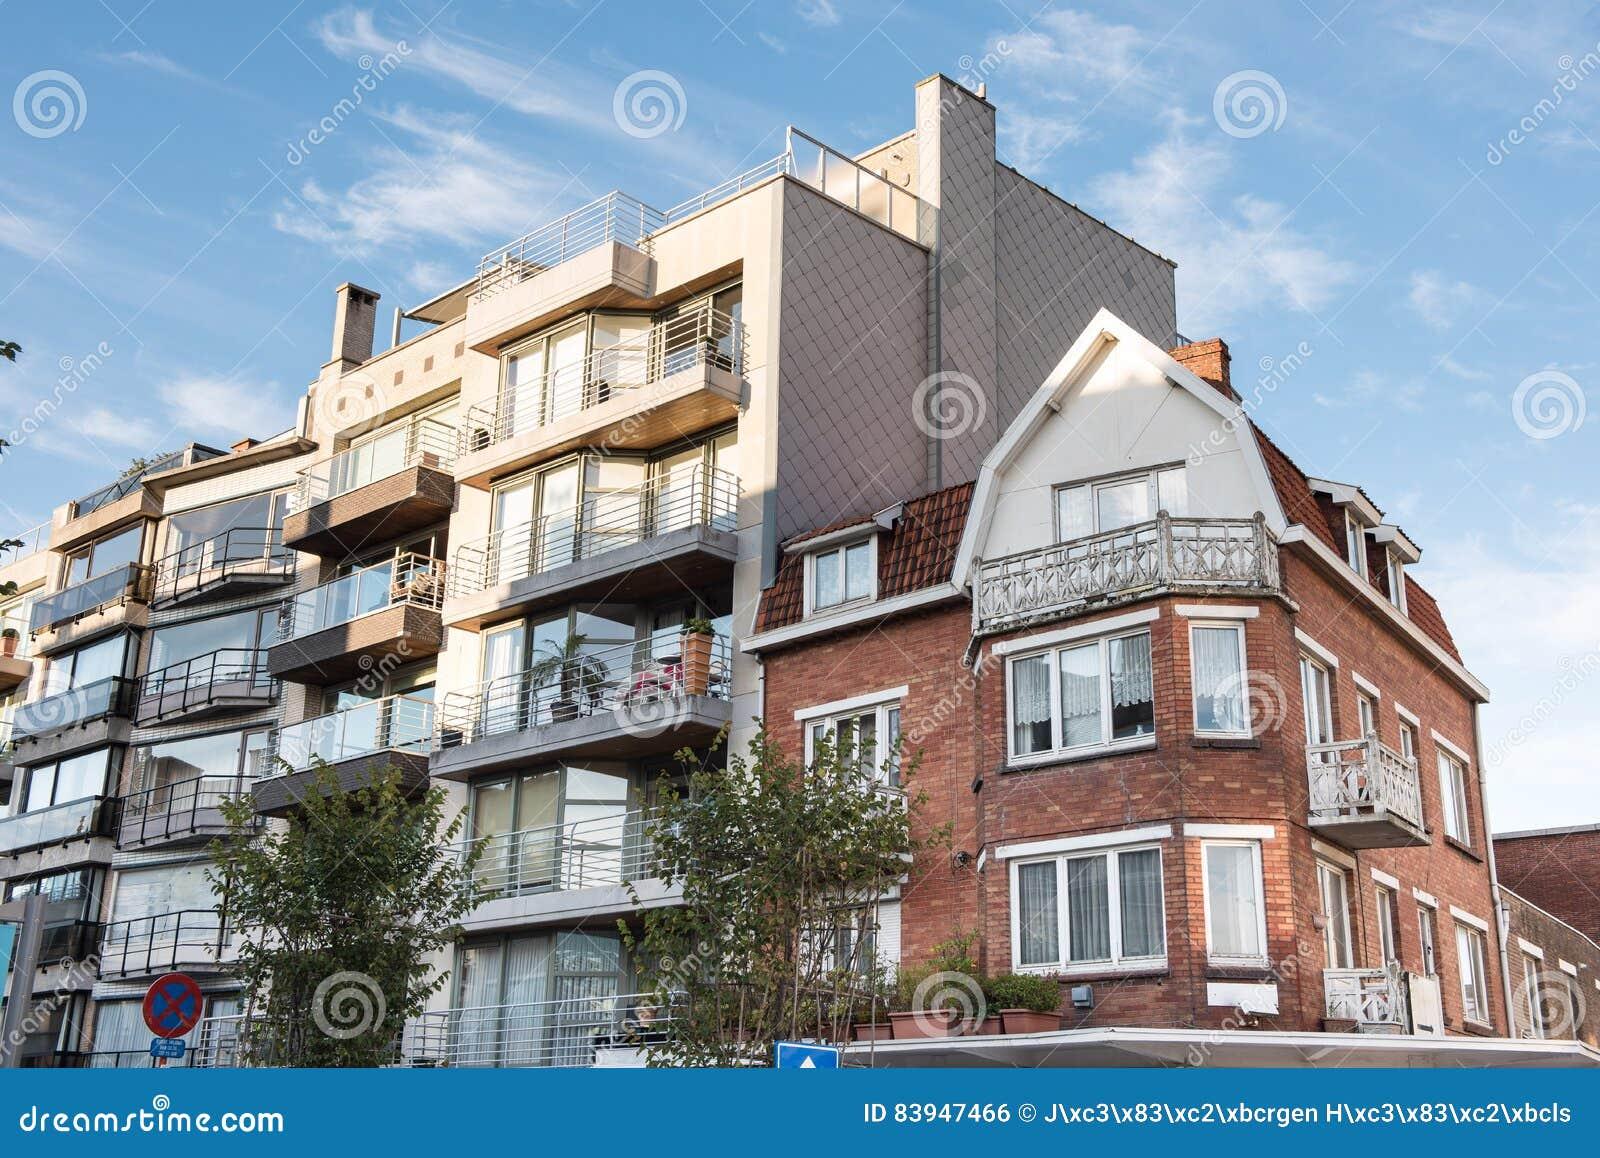 Facciate di case facciate di un condominio di case - Facciate di case colorate ...